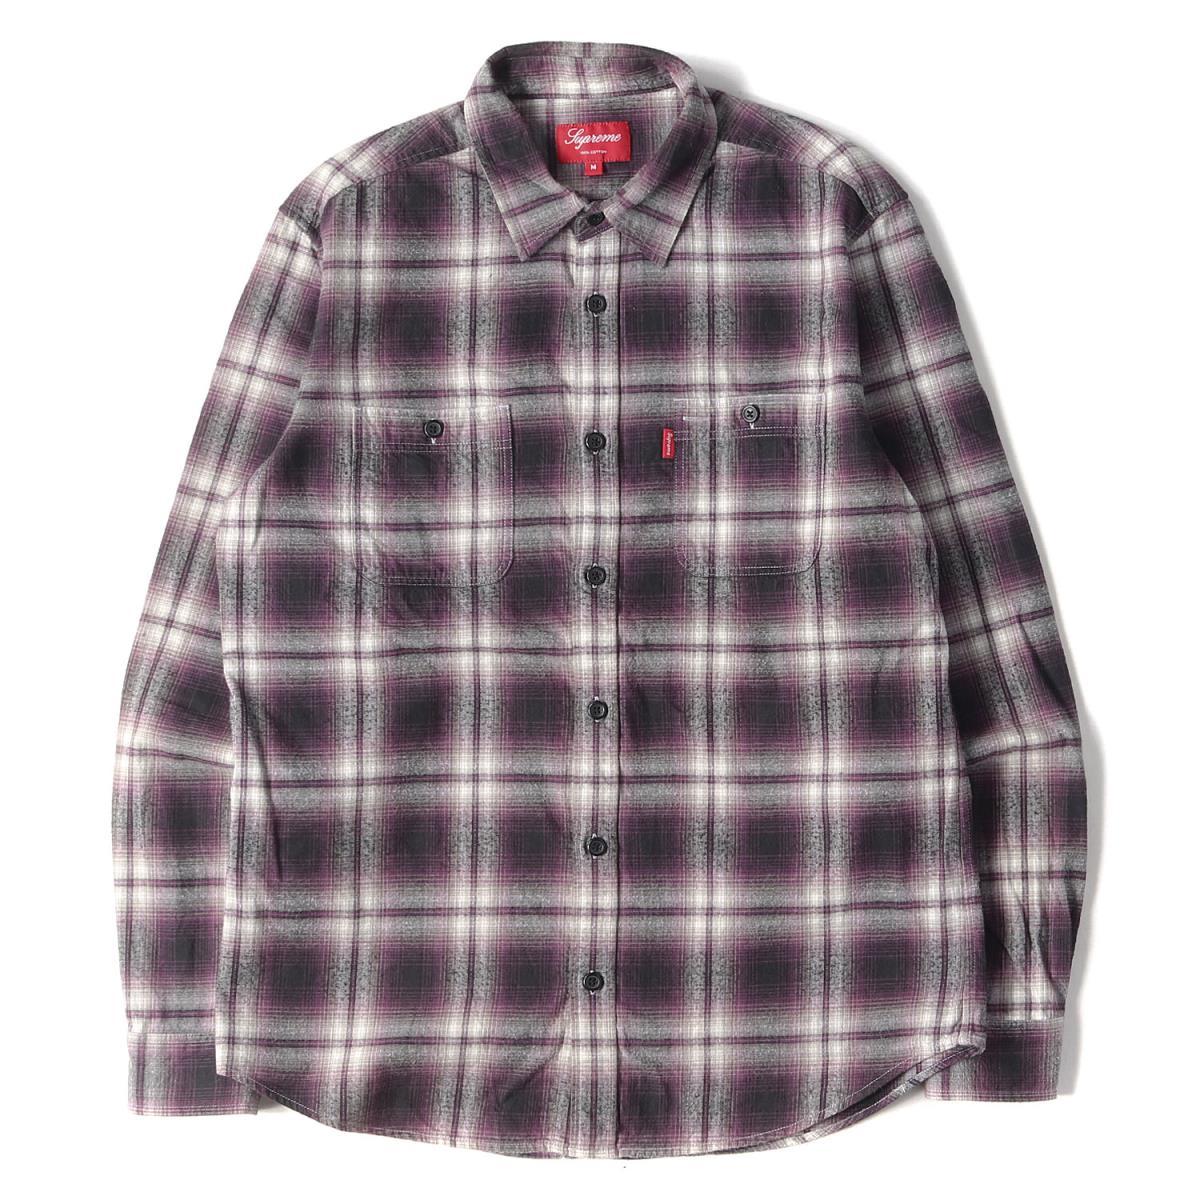 Supreme シュプリーム シャツ オンブレチェック フランネル シャツ Ombre Flannel Shirt 09AW パープル M 【メンズ】【中古】【K2572】